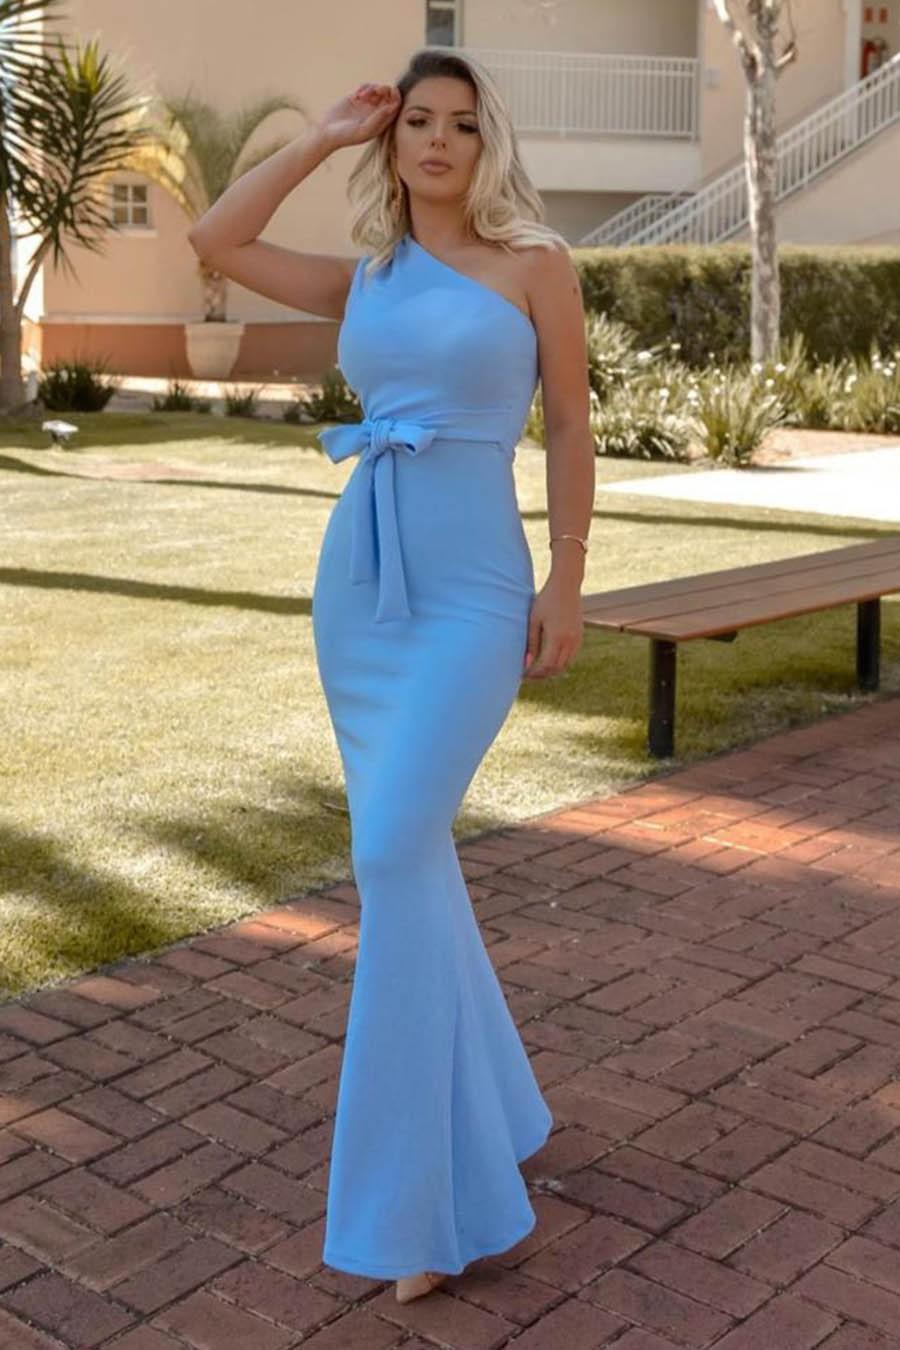 Vestido Longo Crepe Ombro único Laço Azul Claro